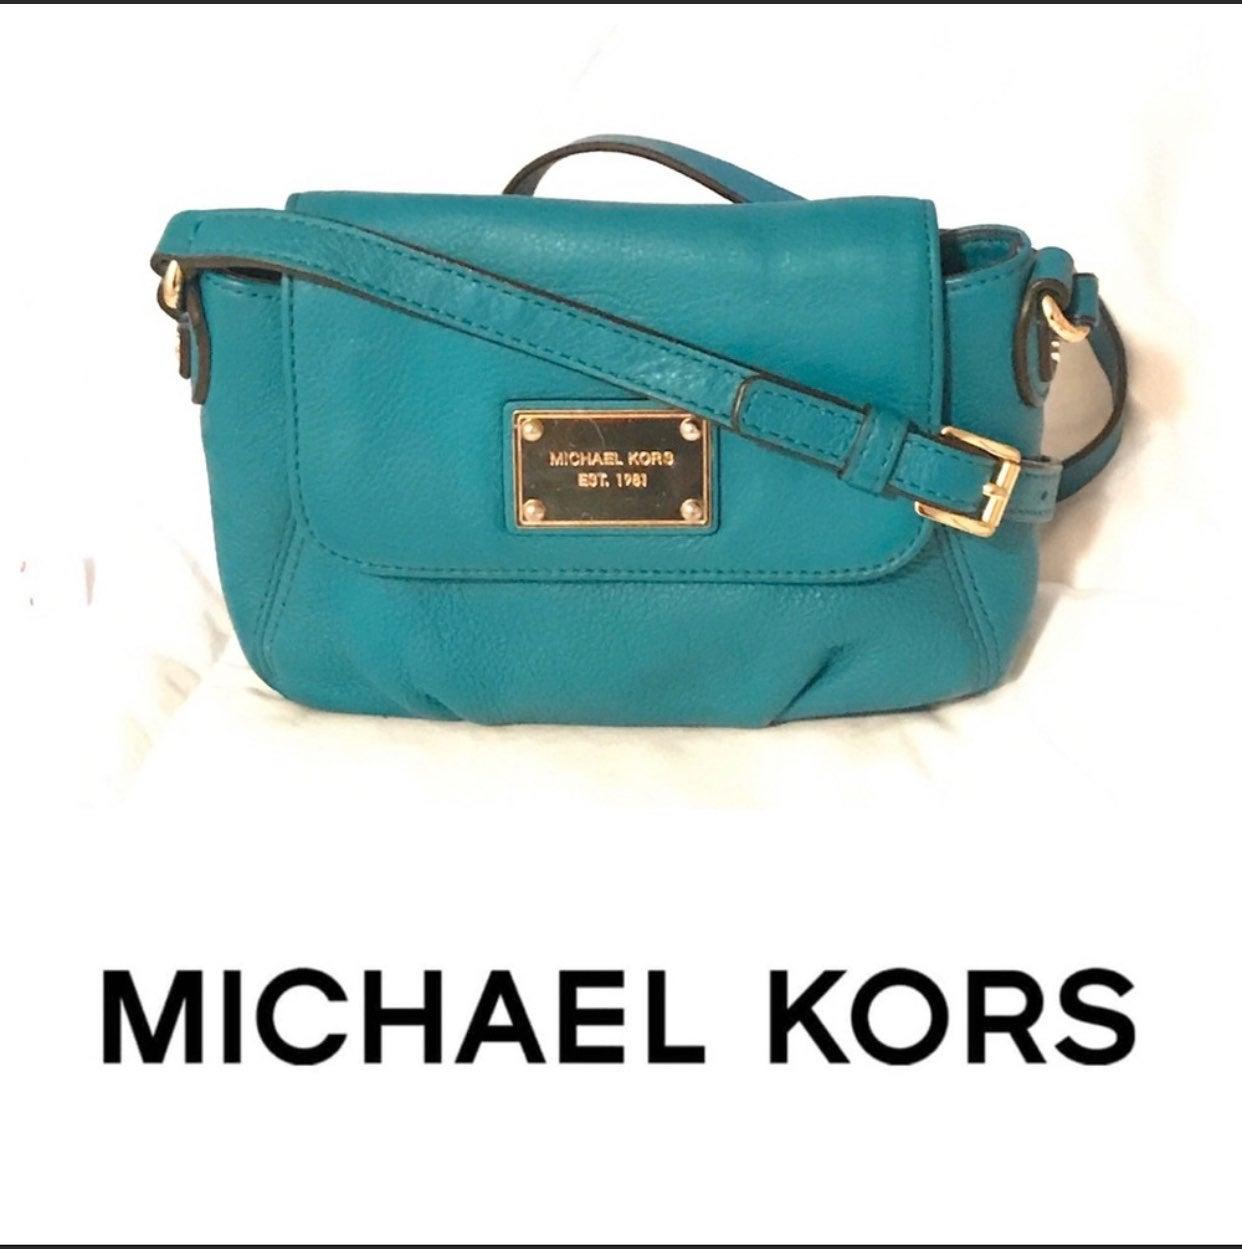 Michael Kors leather Teal Crossbody